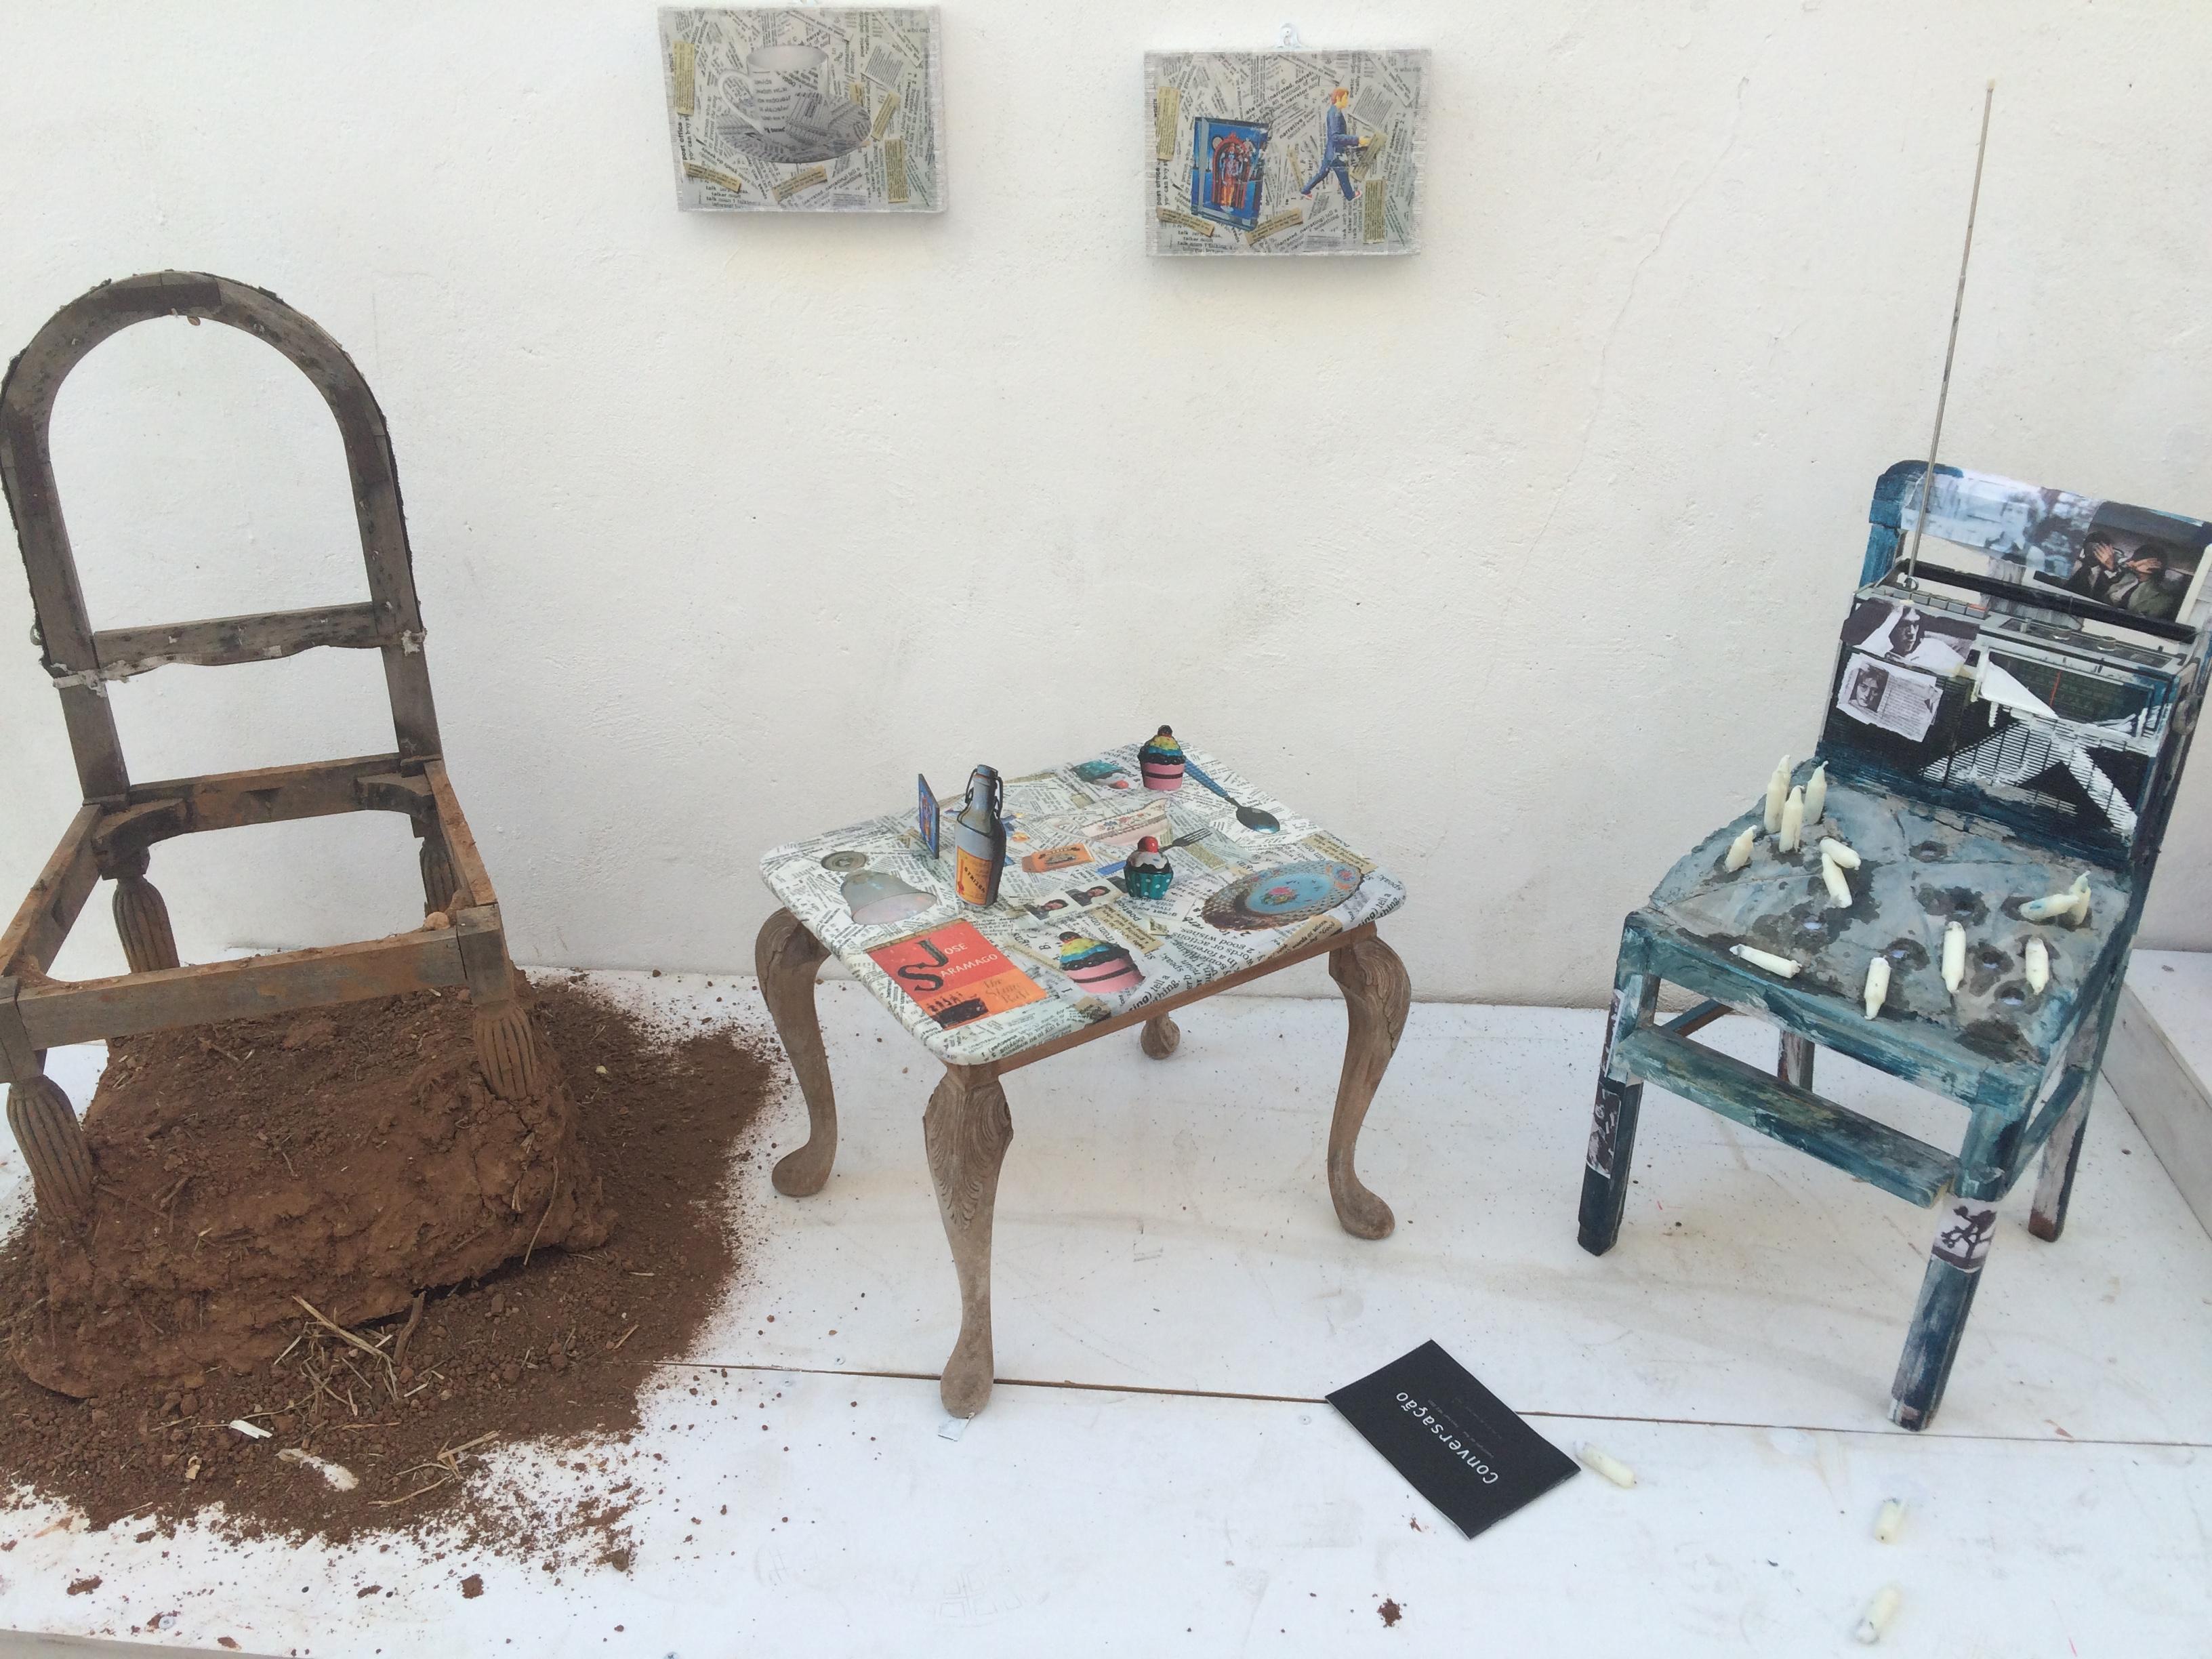 FestivalMed, Loulé művészet. #ezmiez